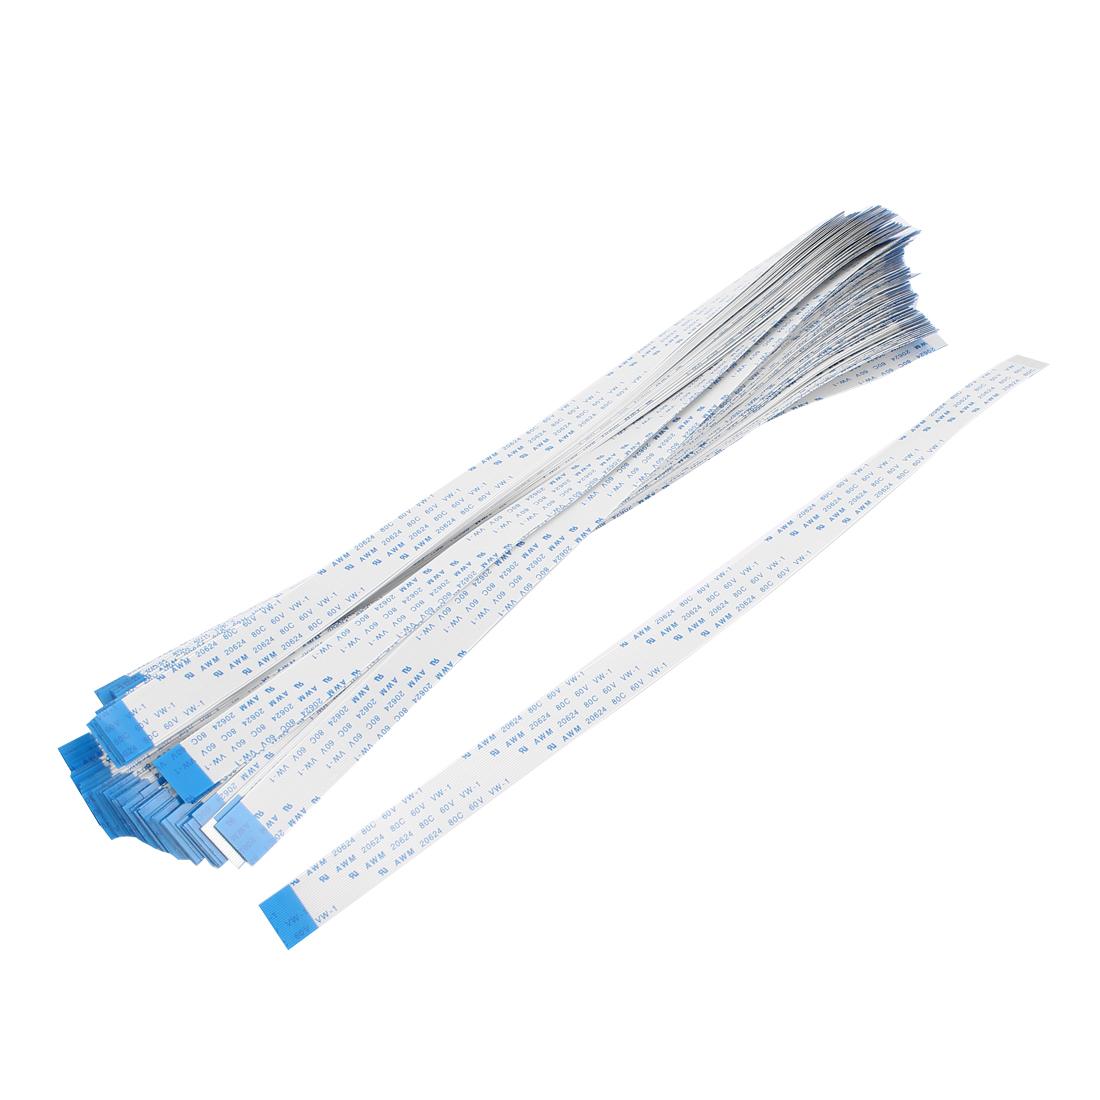 100 Pcs 24 Pins AWM 20624 80C 60V 0.5mm Pitch Flexible Flat Cable FFC 250mm